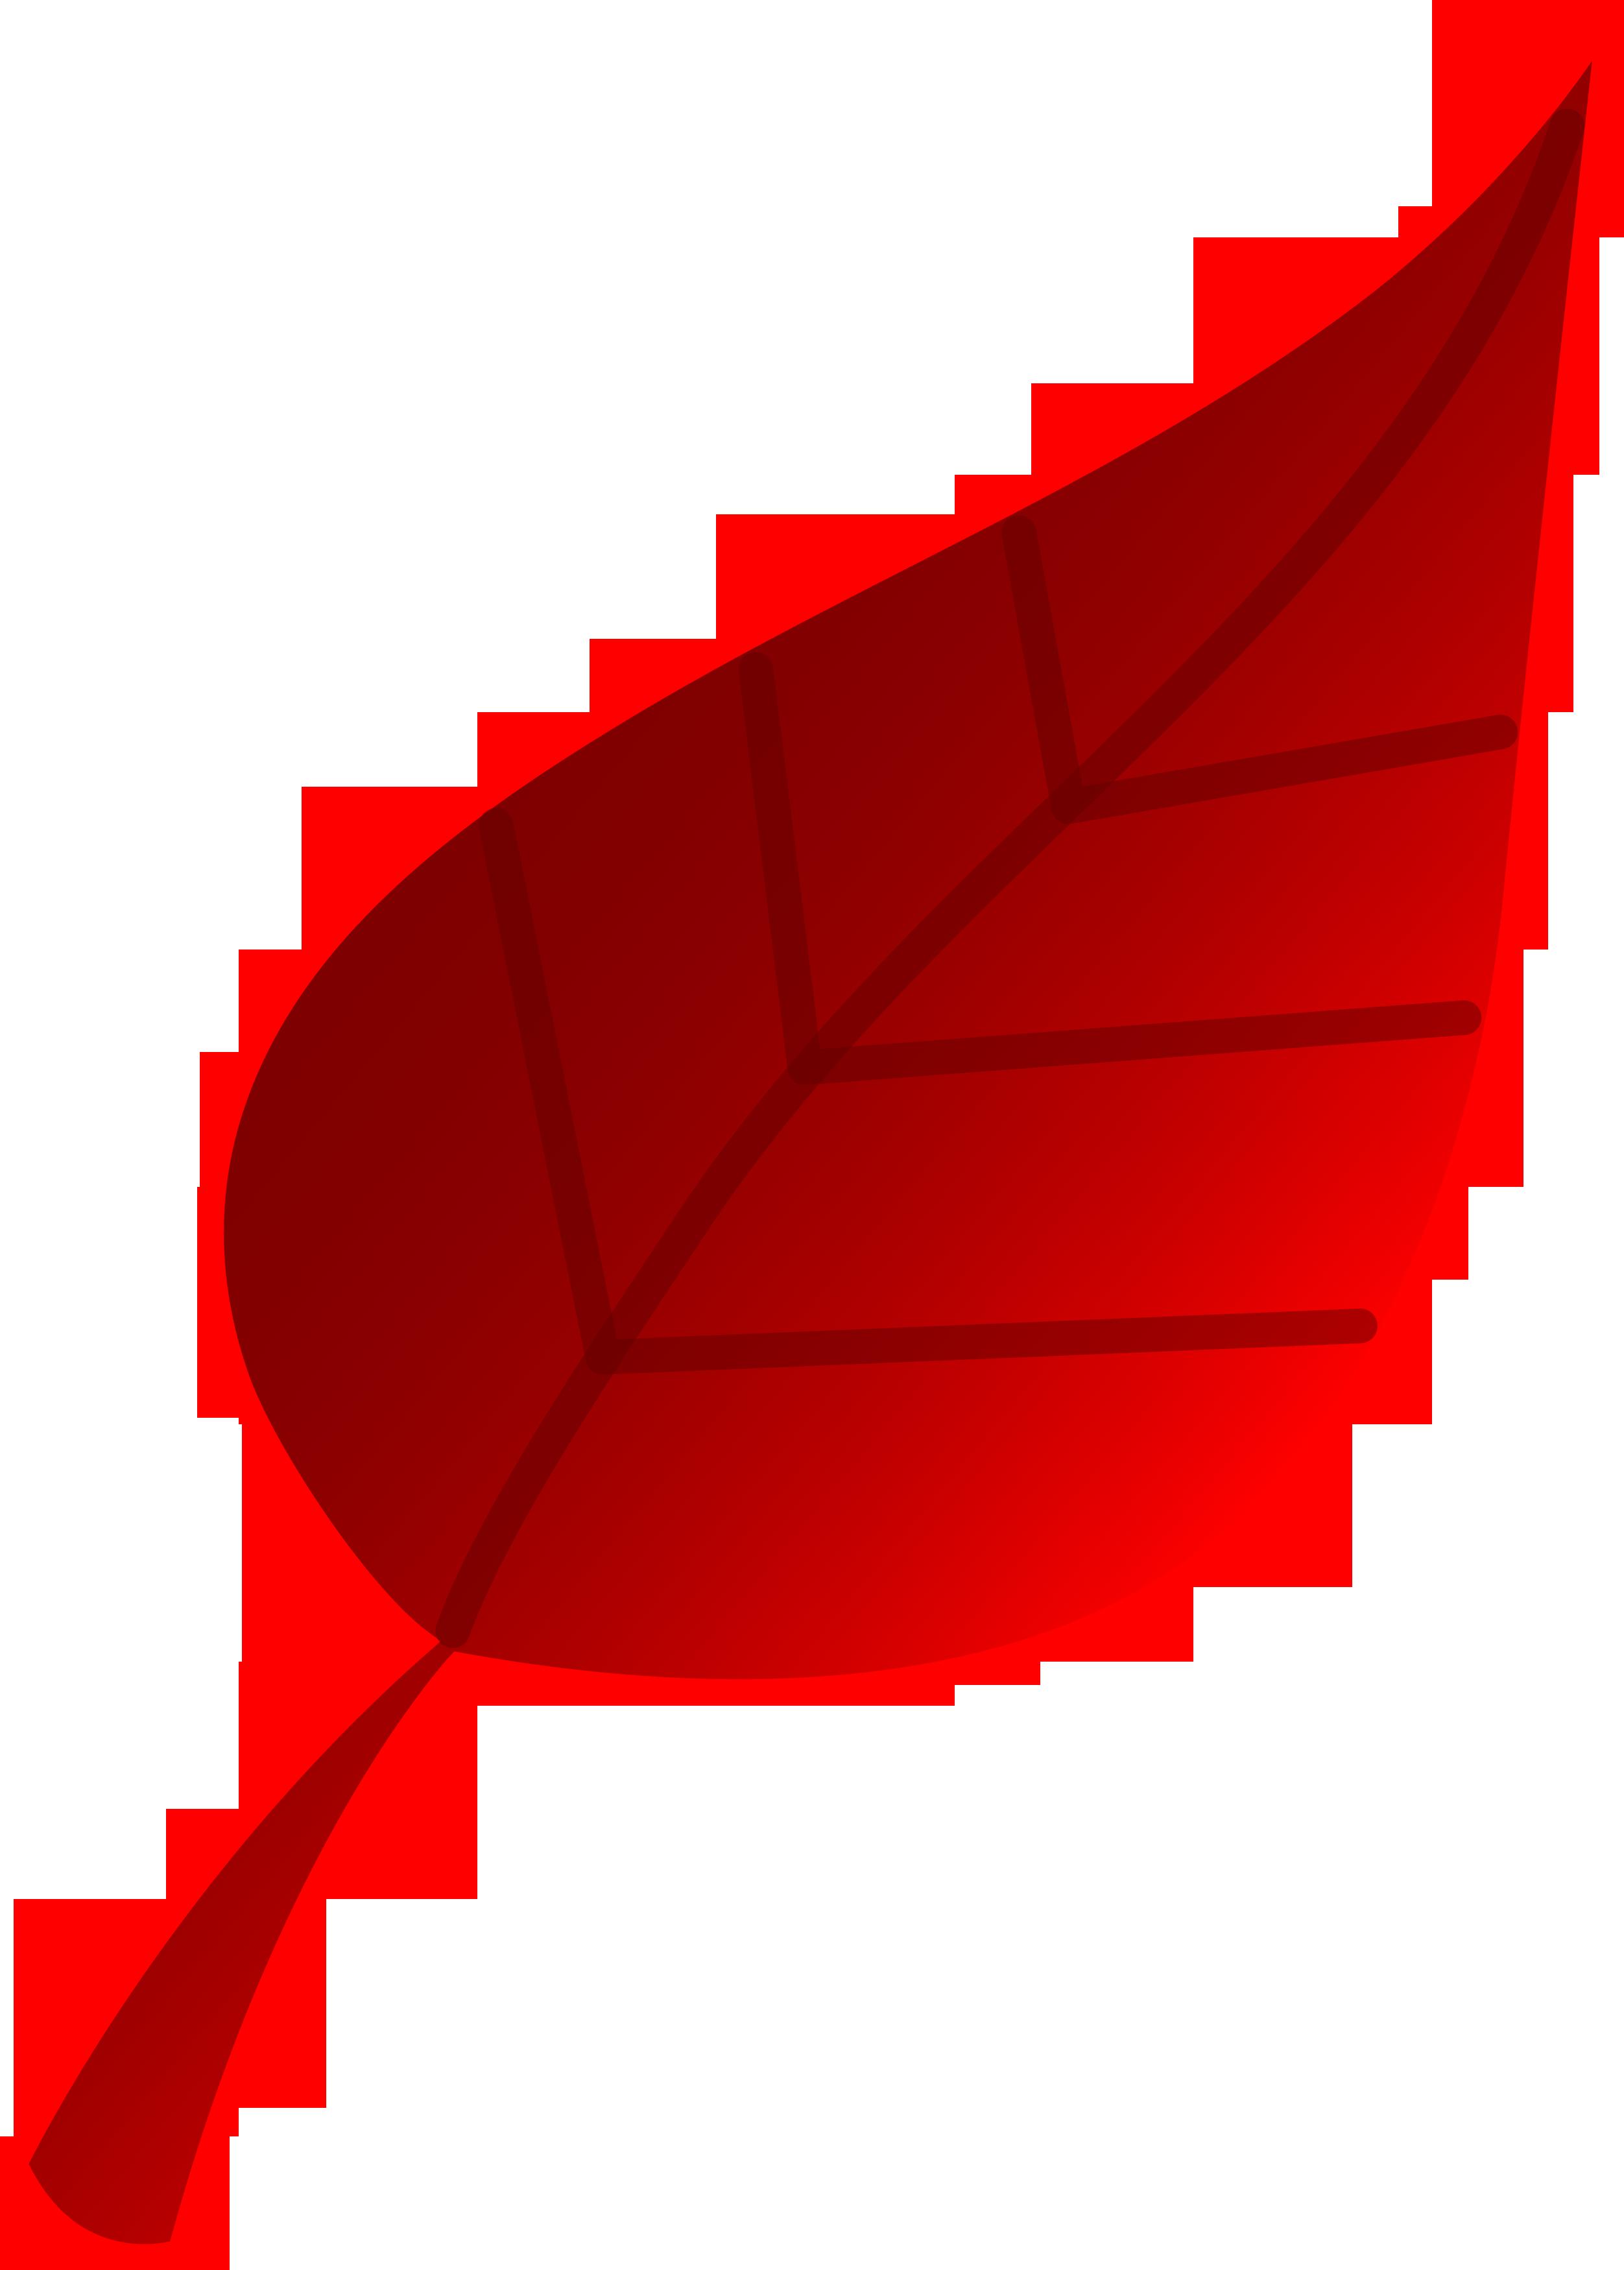 Red Tree Leaf Vector Art - Free Clip Art